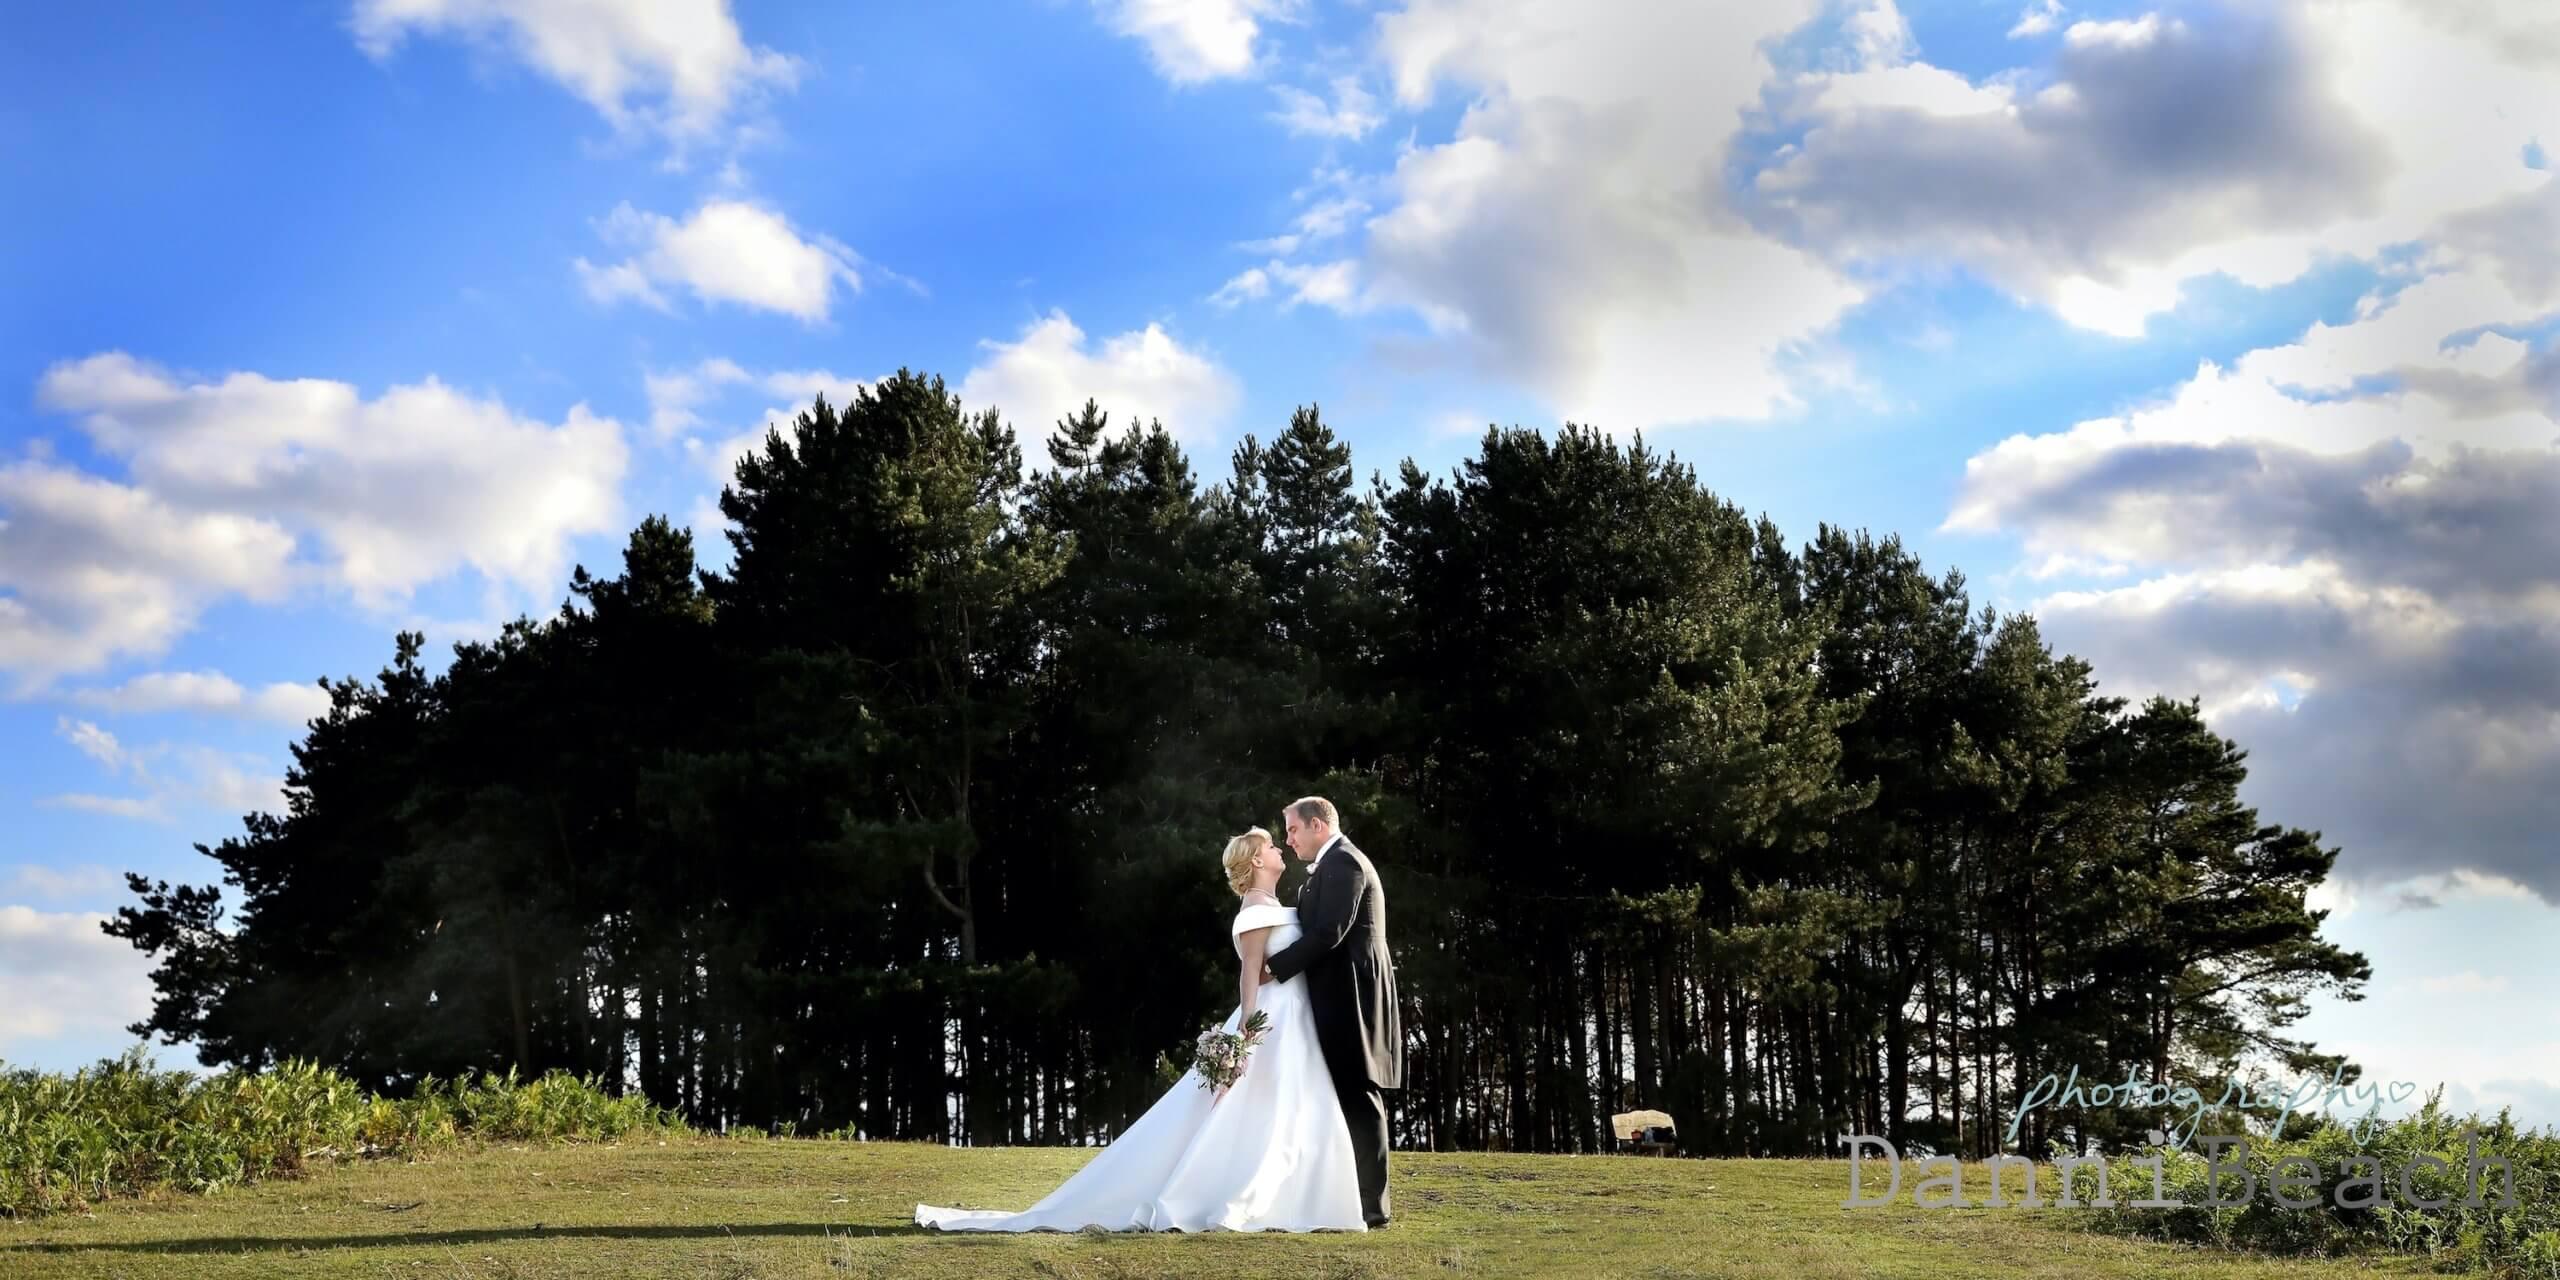 ASHDOWN FOREST WEDDING PHOTOGRAPHER